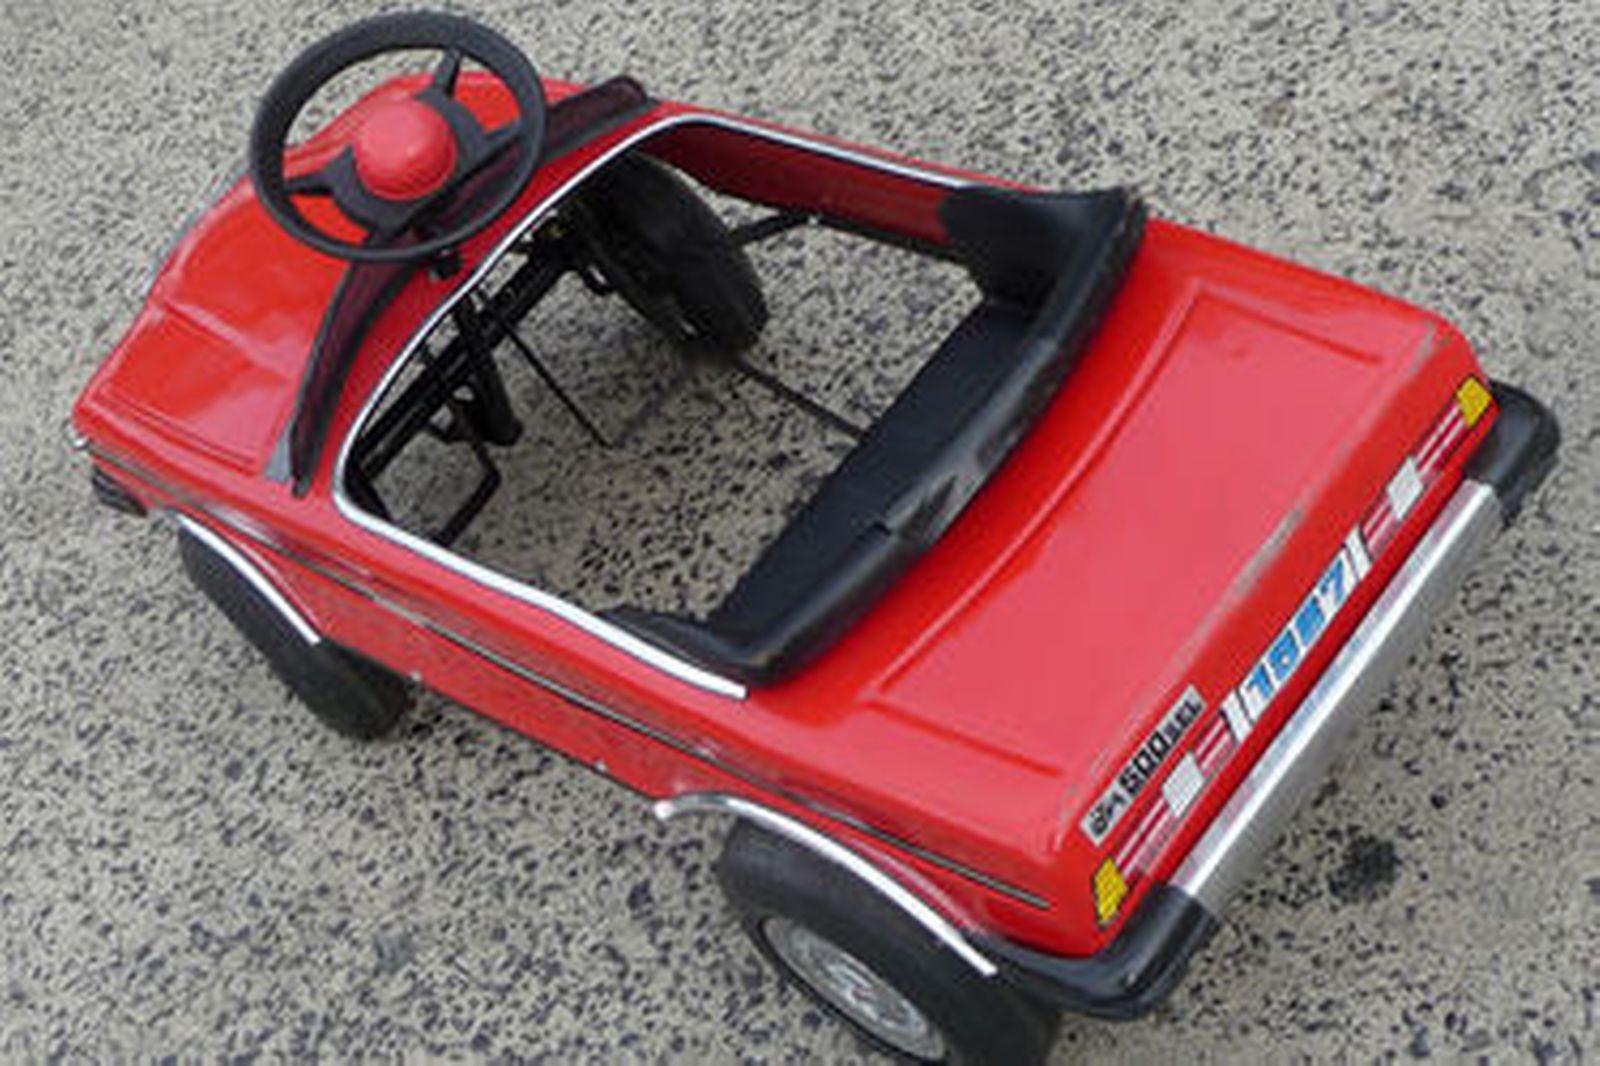 sold  pedal car - 1987 mercedes-benz 500sel auctions